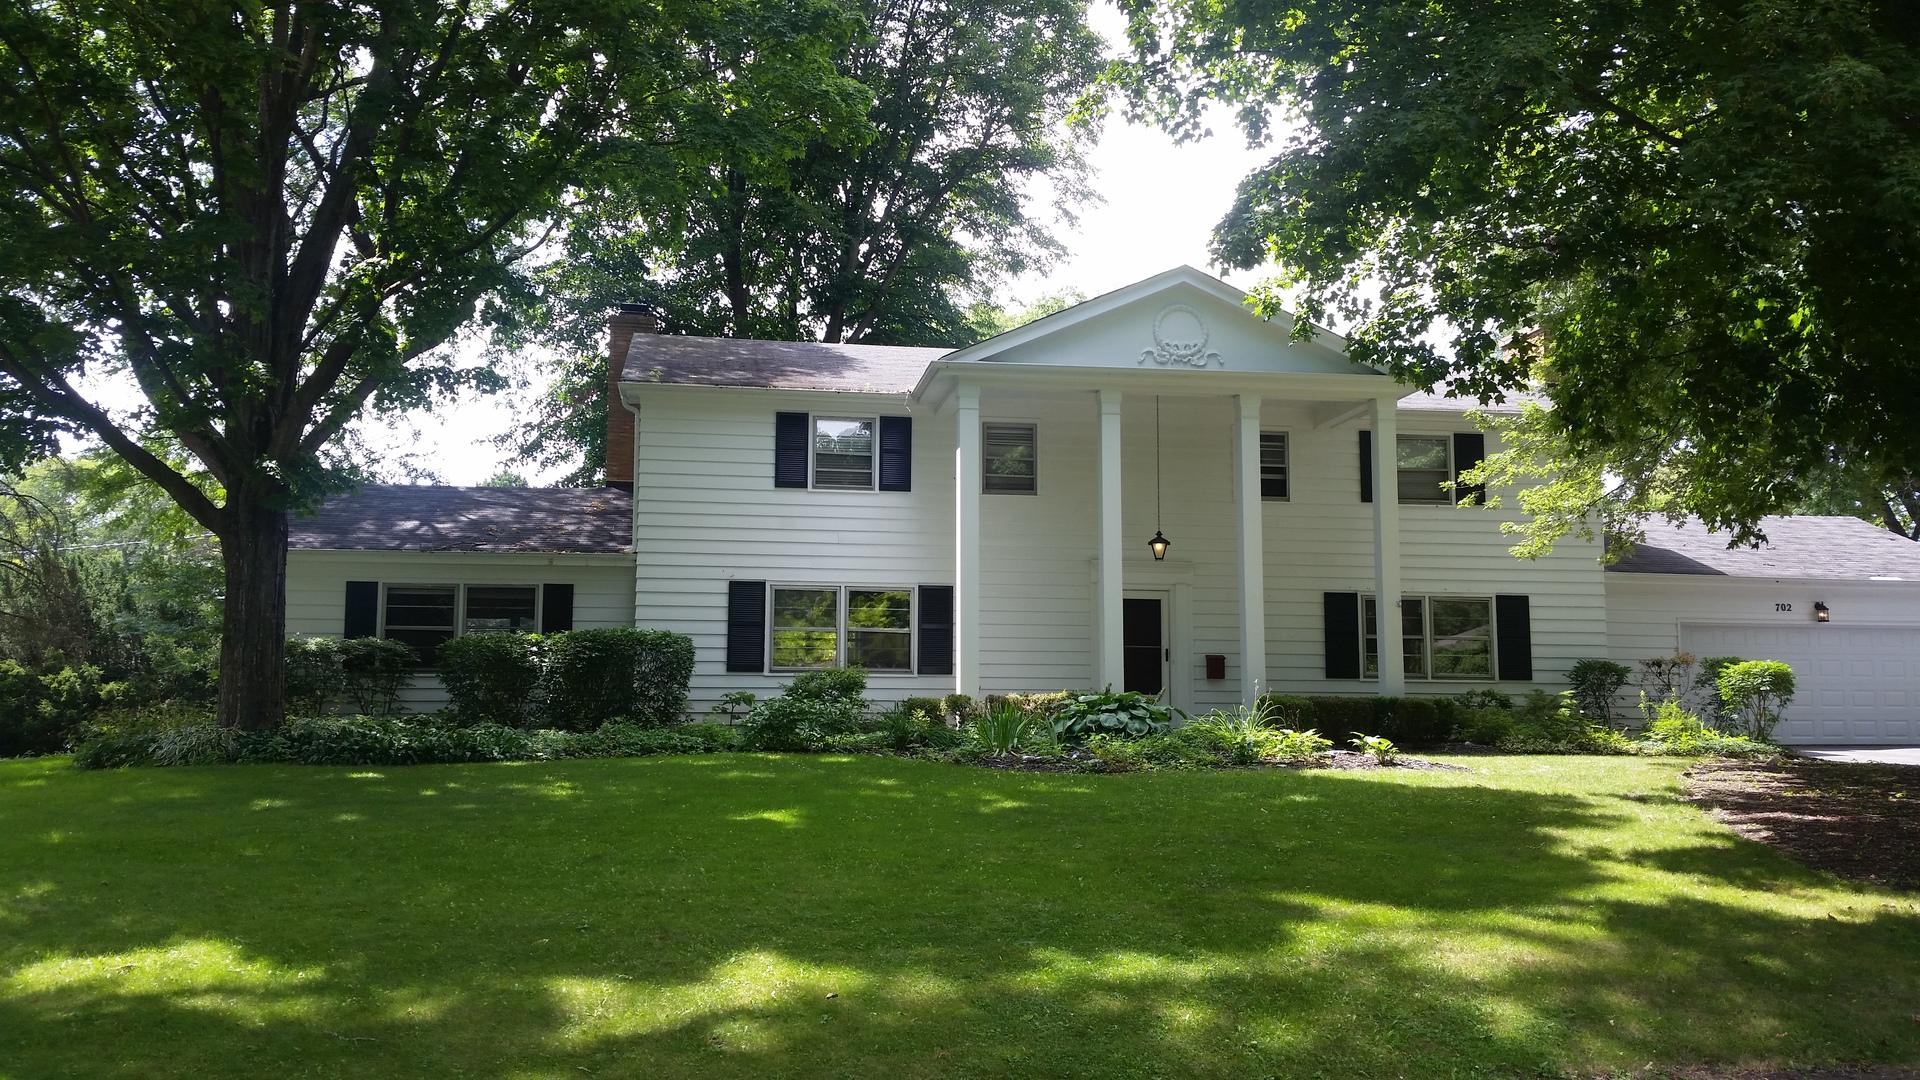 Propertyup 09009204 Sale 515 Charles Geneva Illinois 60134